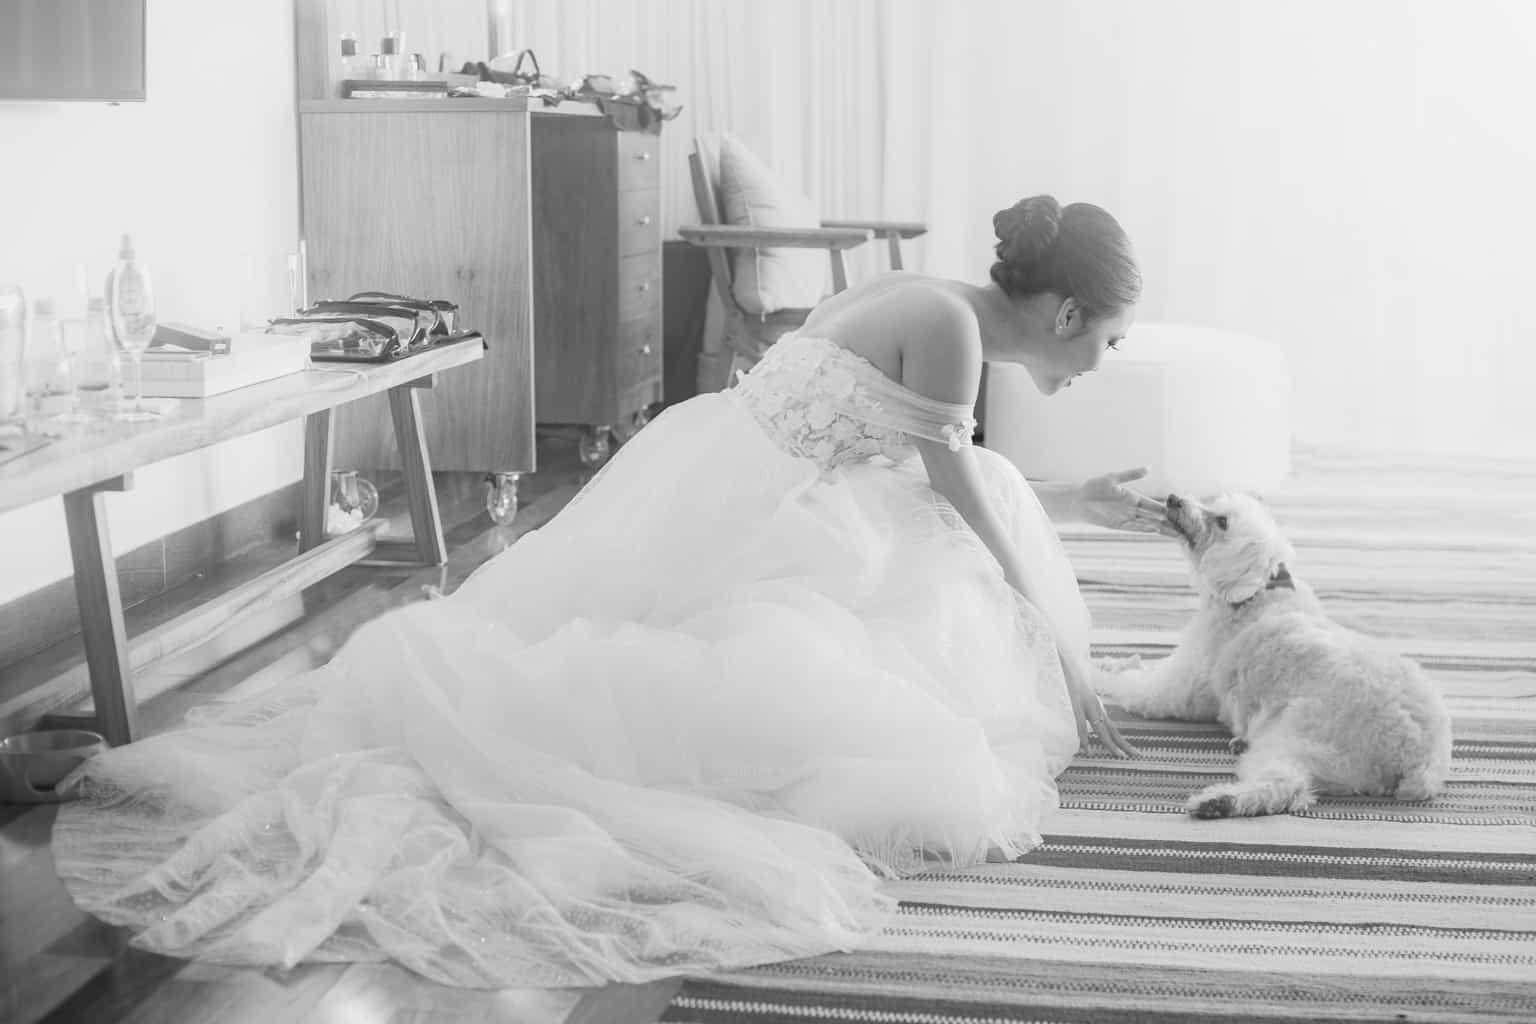 Casamento-Alissa-e-Gustavo-Cerimonial-Manu-Goncalez-Decor-Andrea-Kapps-Fasano-Angra-dos-Reis-Foto-VRebel-G-Junior-Making-of1892-Edit